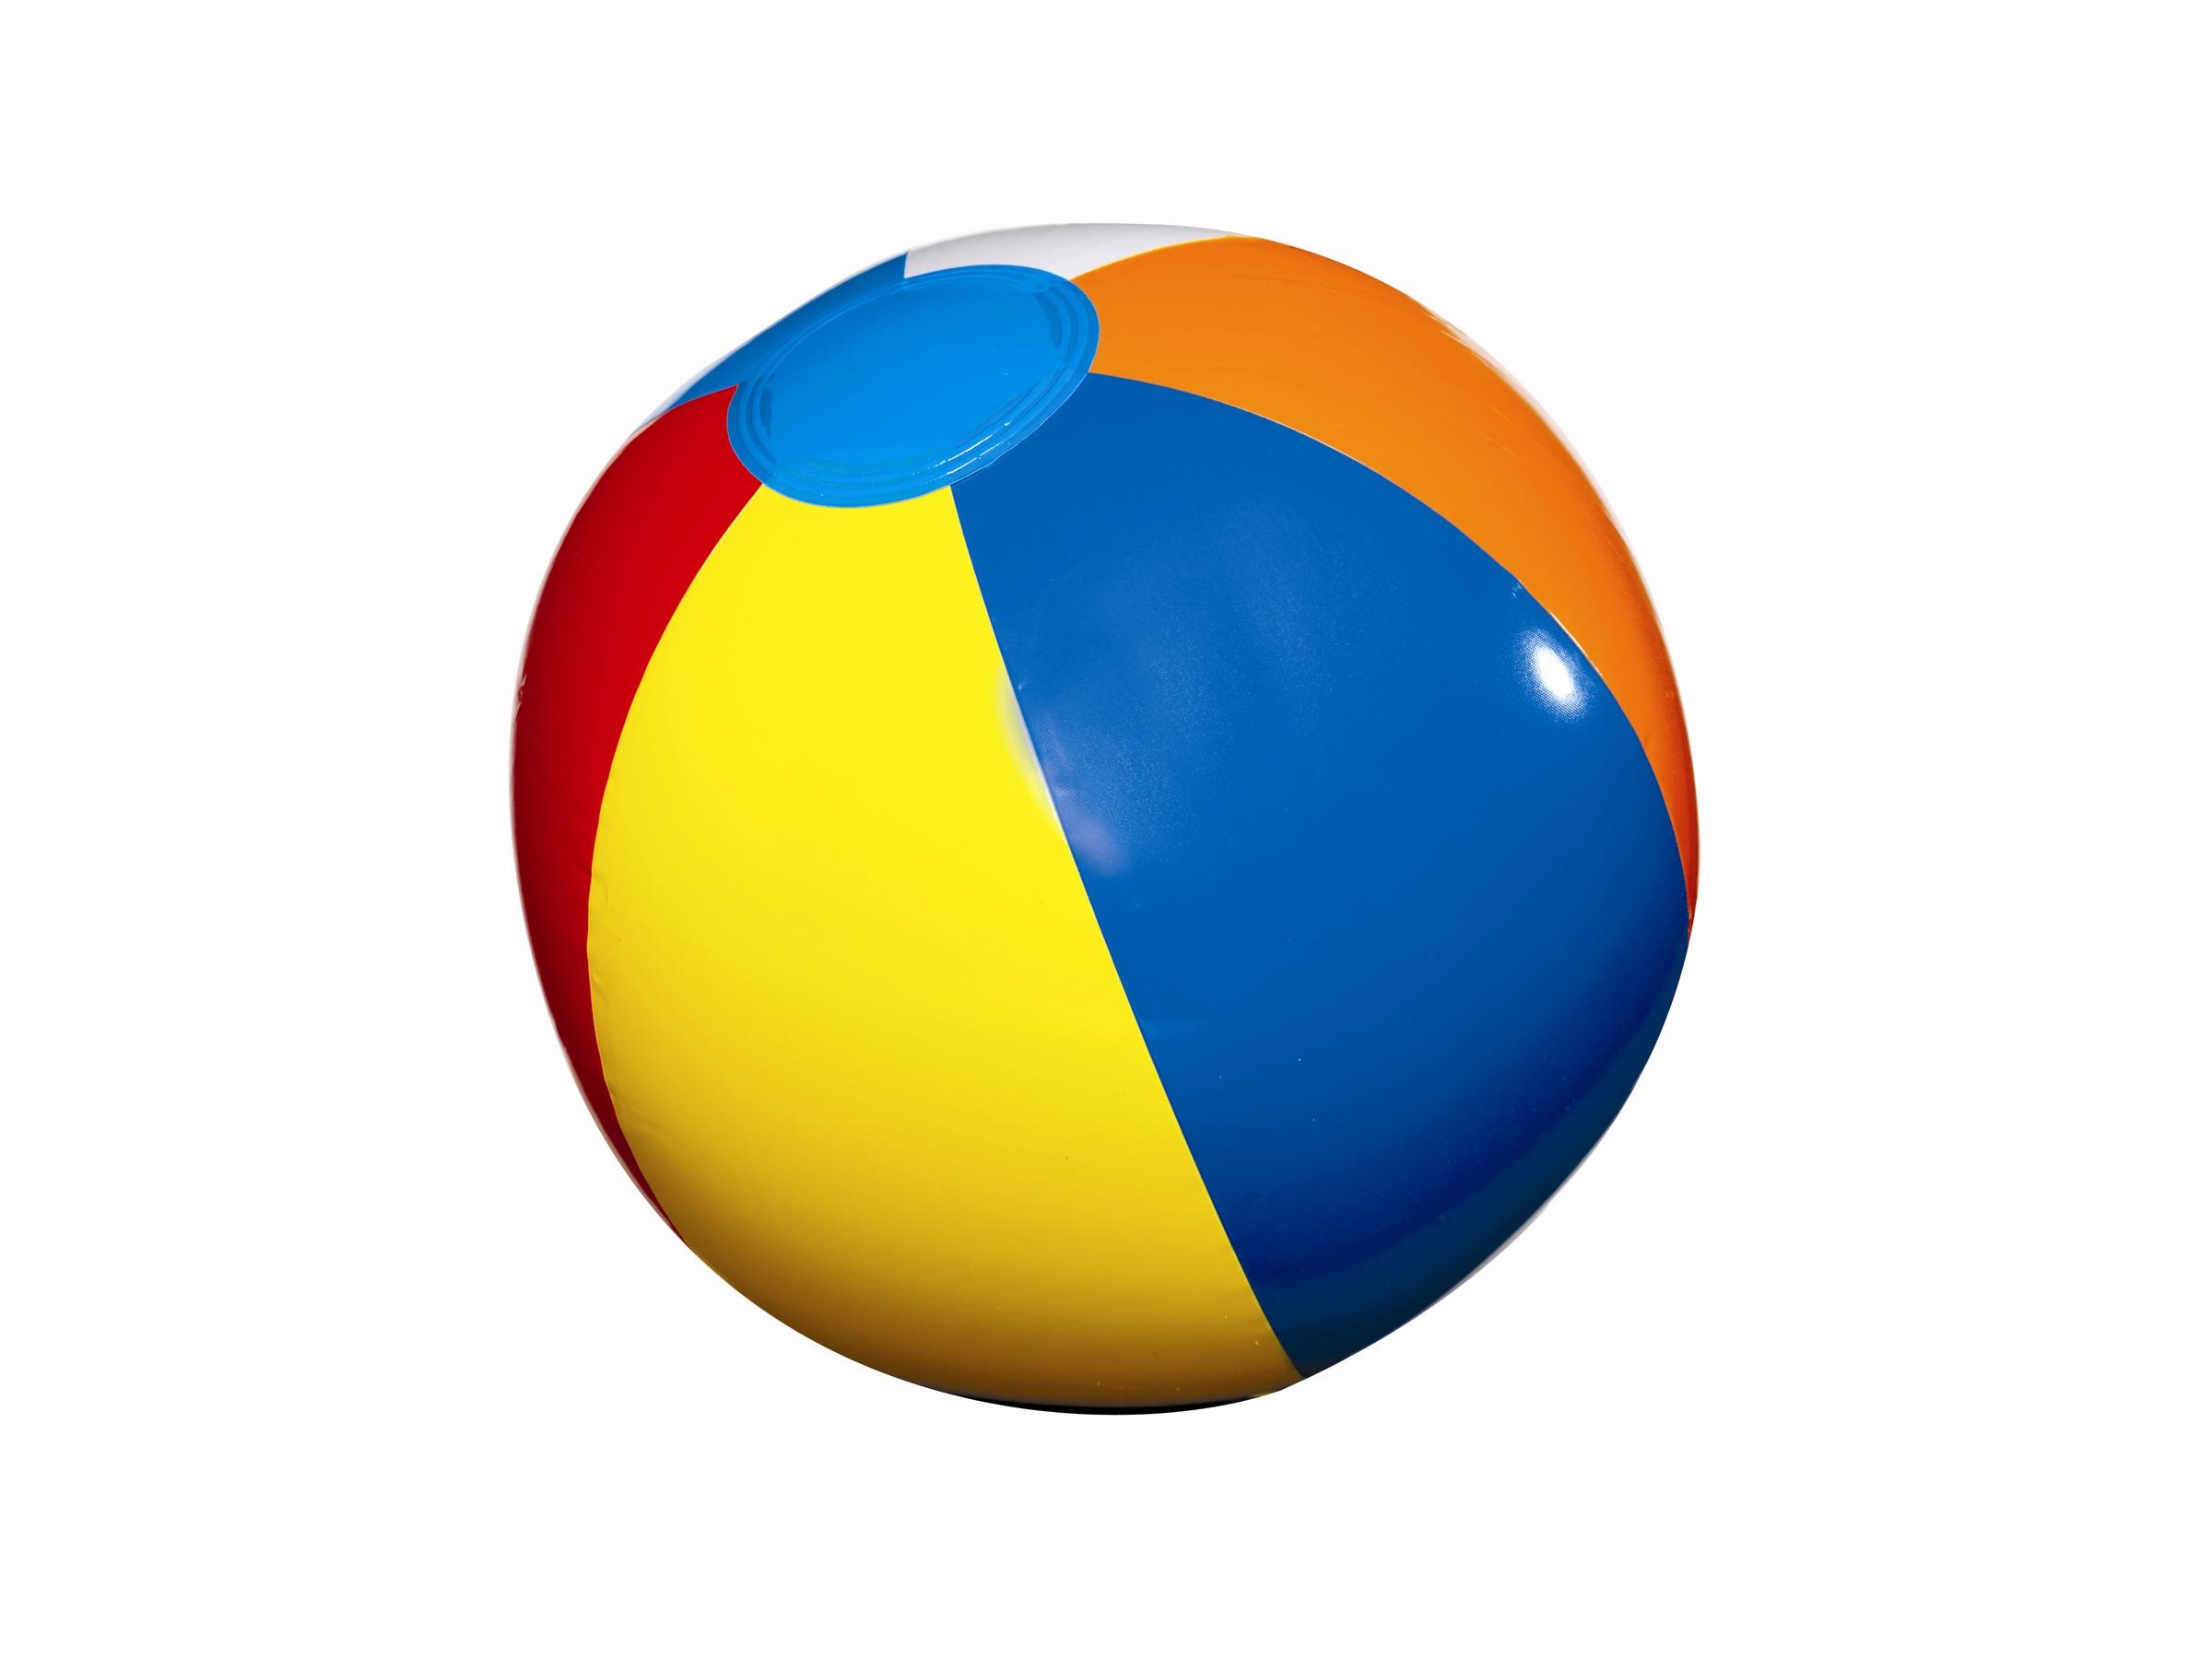 Free Beach Ball Clip Art, Download Free Clip Art, Free Clip Art on.